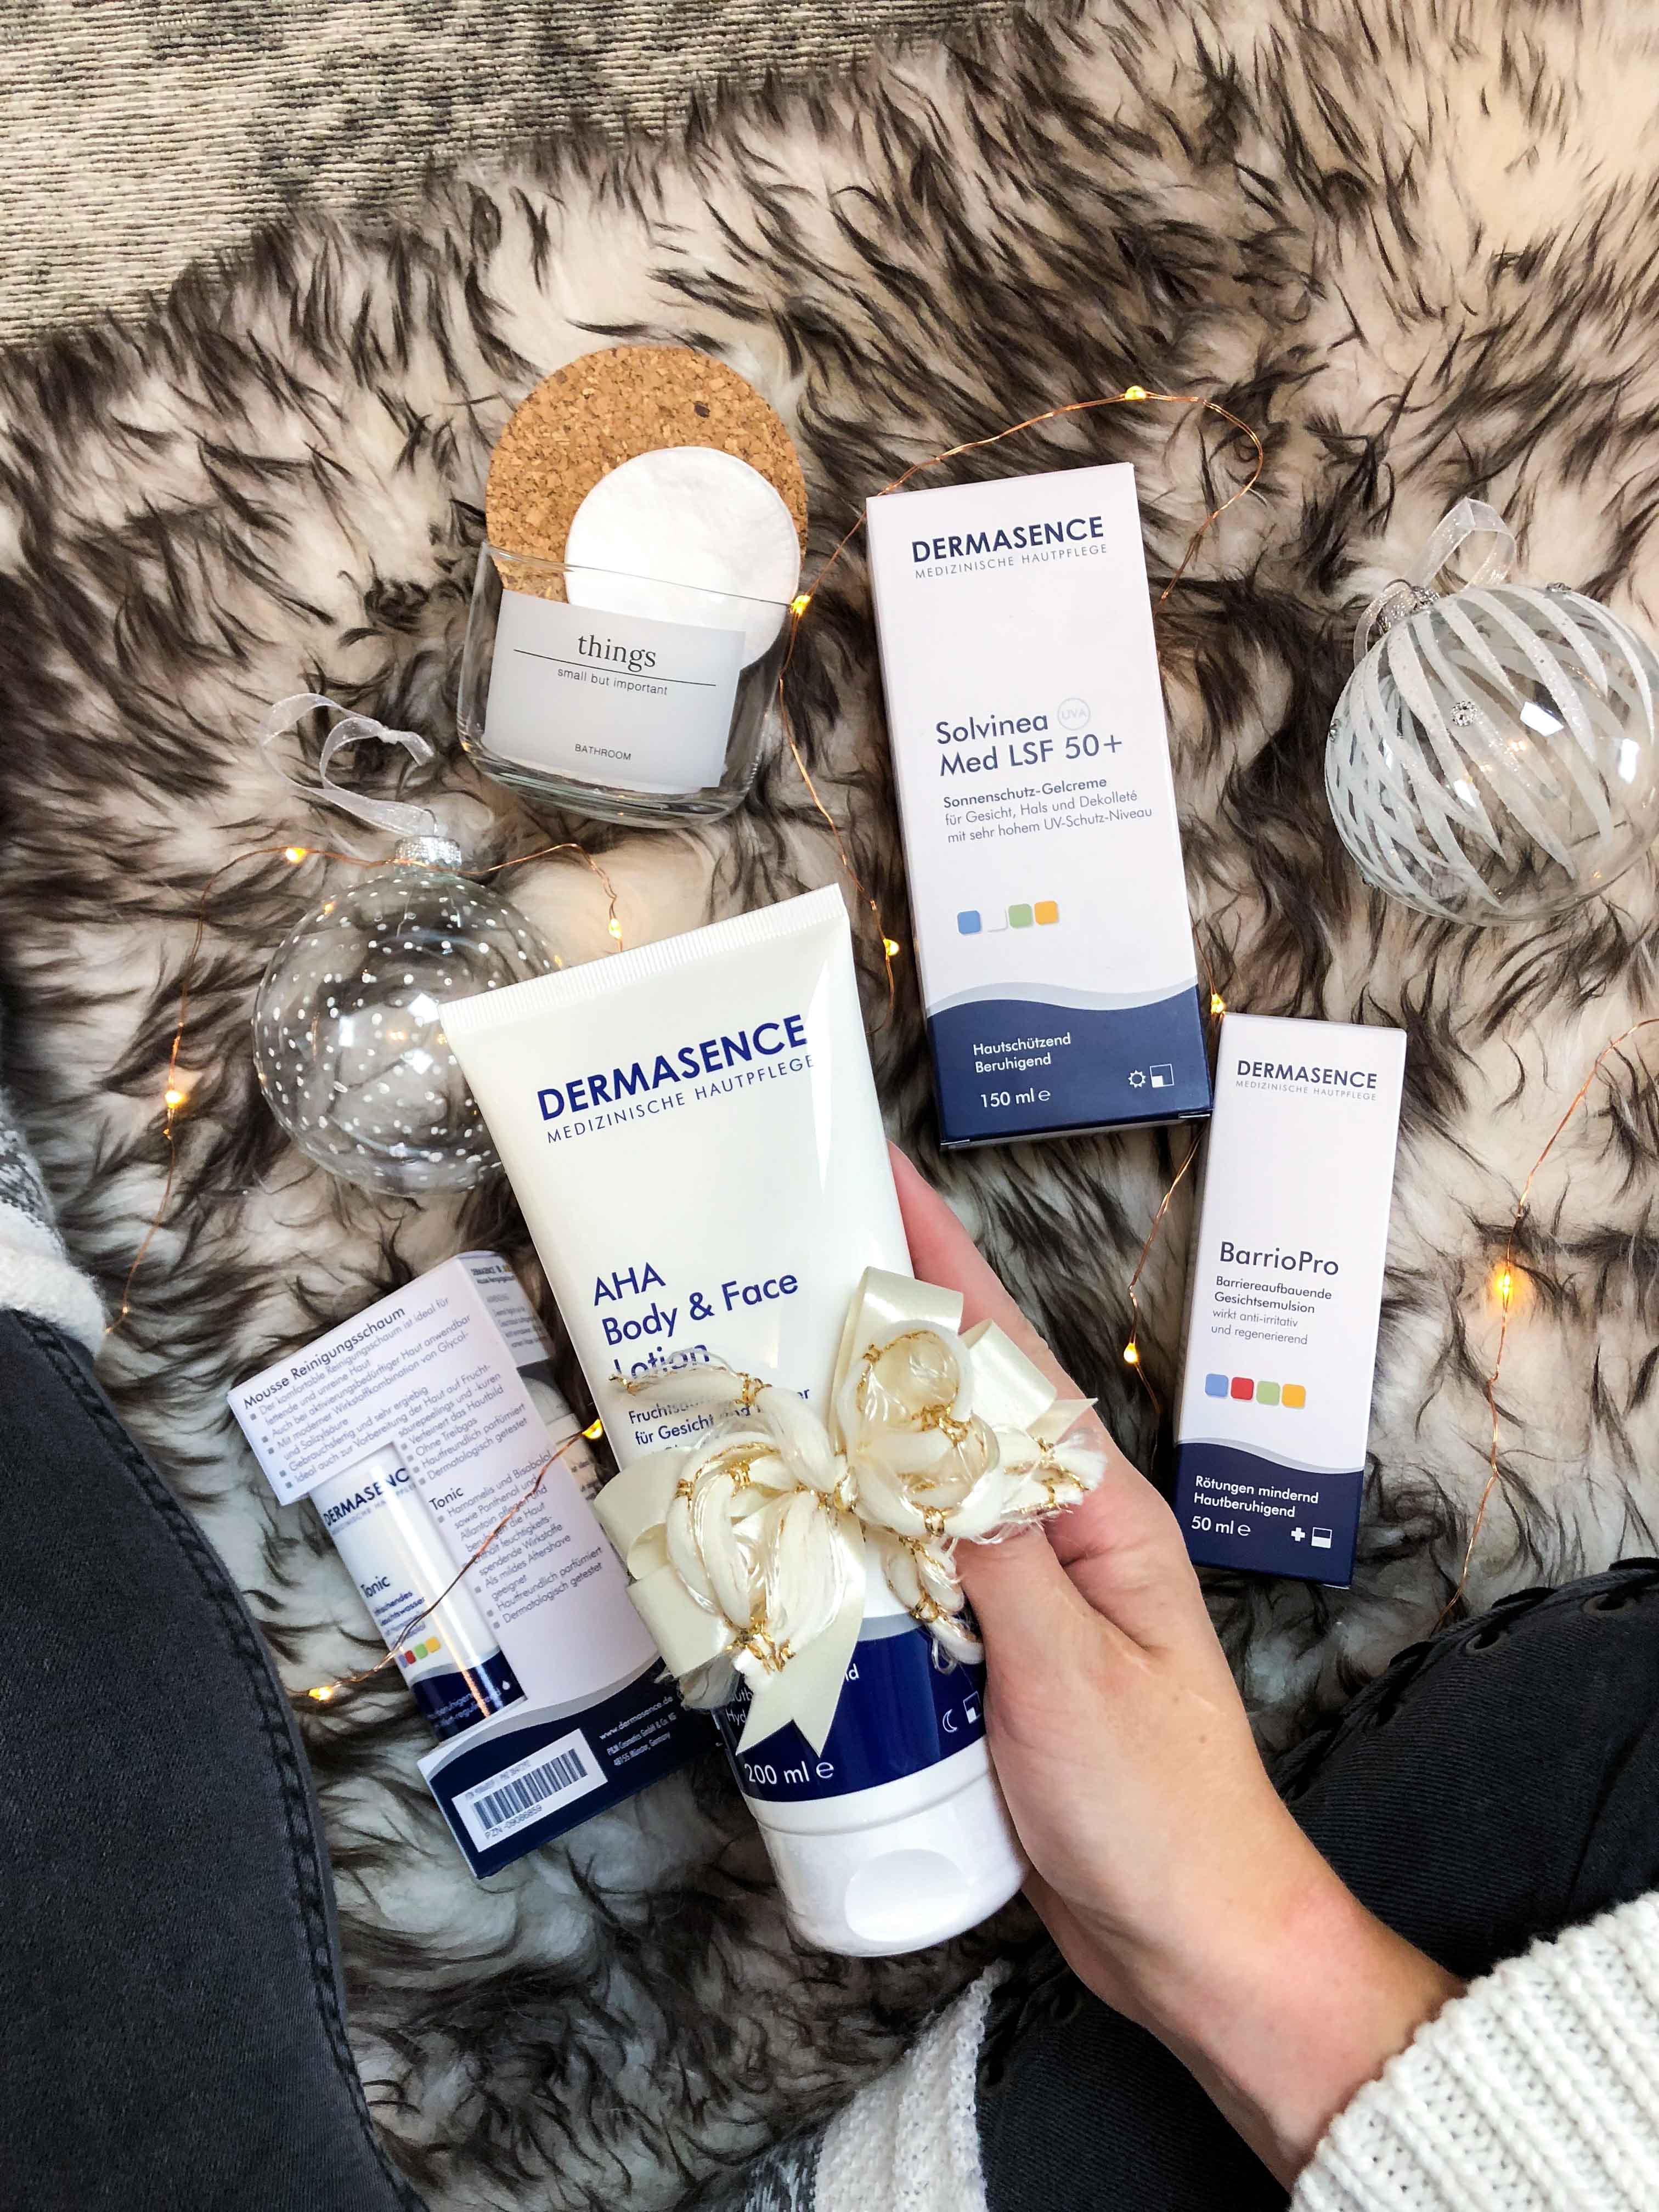 Blogger Adventskalender Gewinnspiel Dermasence Hautpflege Winter Urlaubs-Reiseset Tonic Mousse AHA Body Face Lotion Solvinea Med LSF 50 Beauty Blogger Tipps